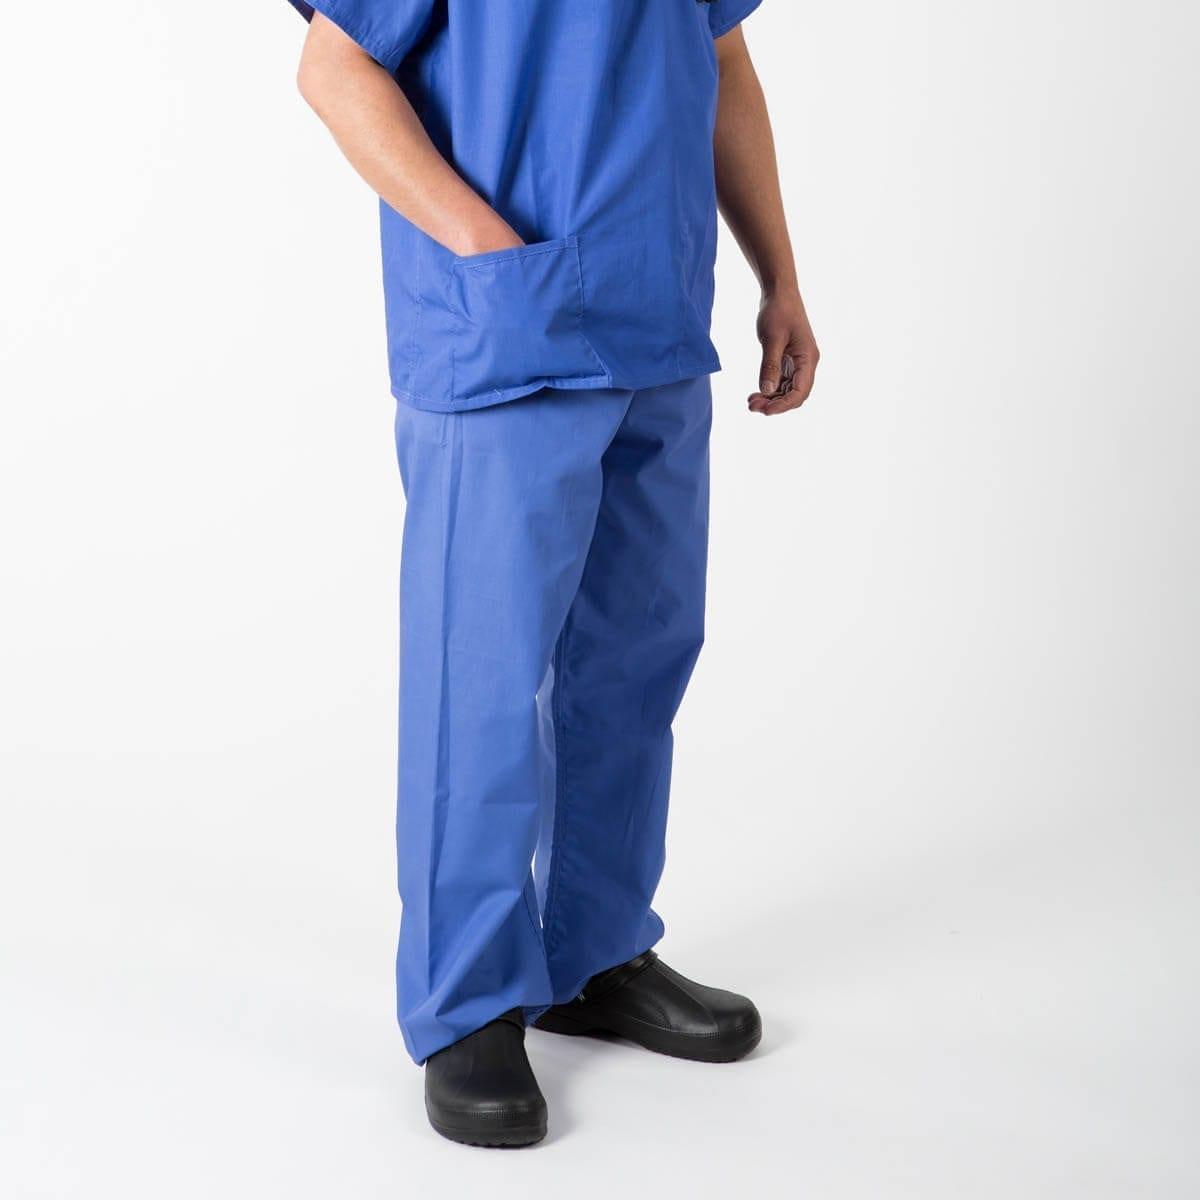 Mid Blue Scrub Pants | Scrub Suit Trousers | Interweave Healthcare